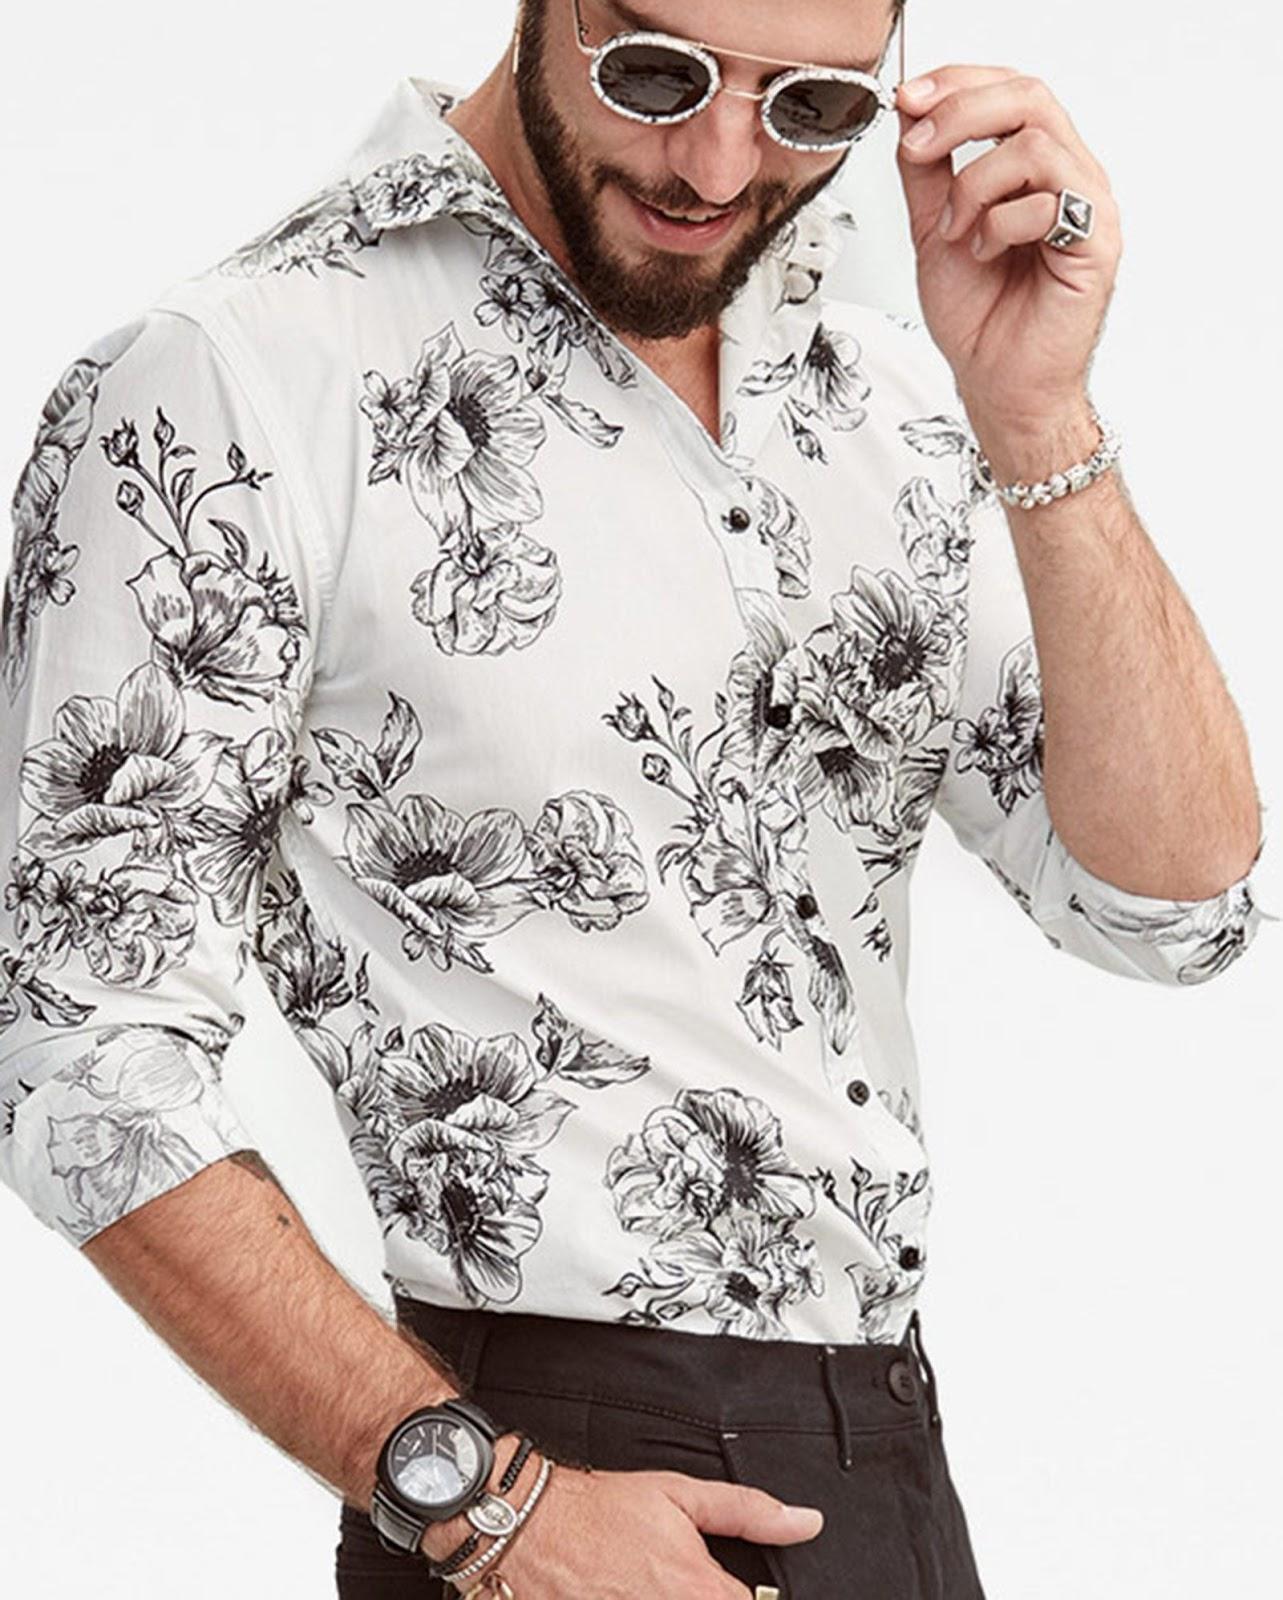 LEO KLEIN - KADU DANTAS PARA RIACHUELO - Camisa Floral P&B